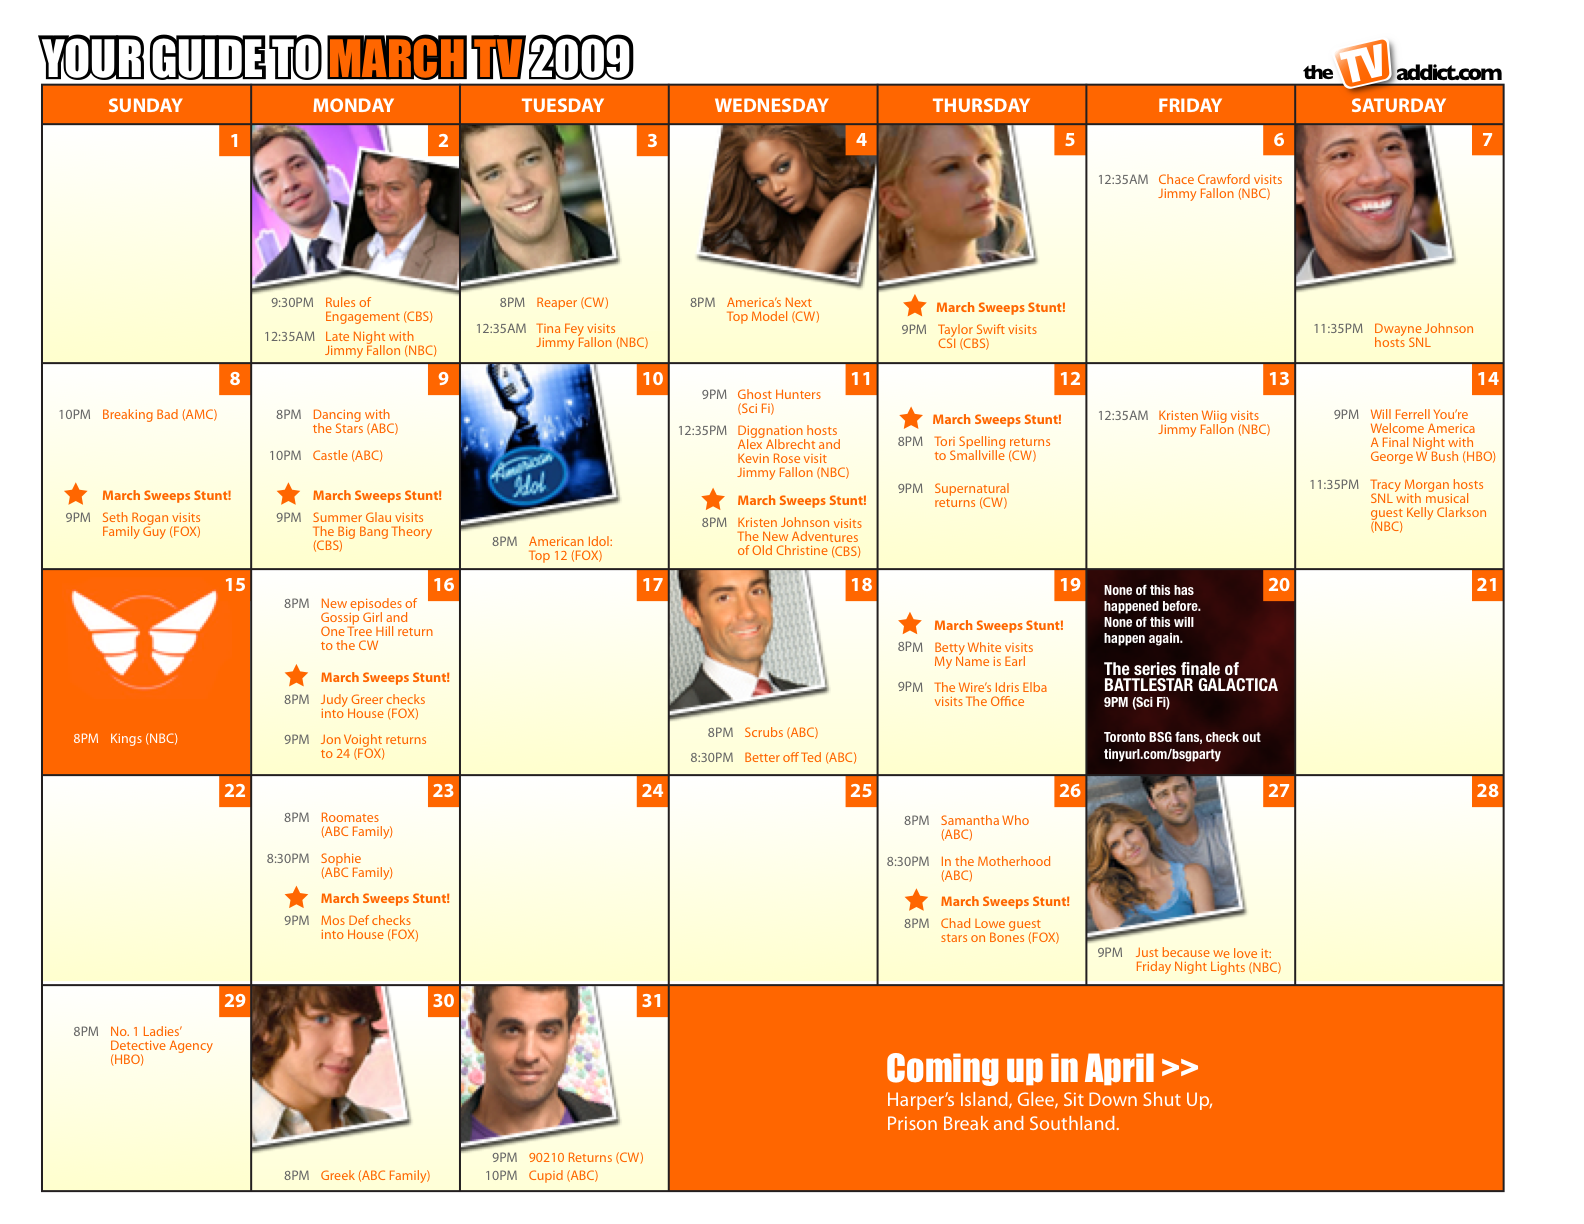 2009 március naptár A márciusi sweeps naptár   comment:com 2009 március naptár